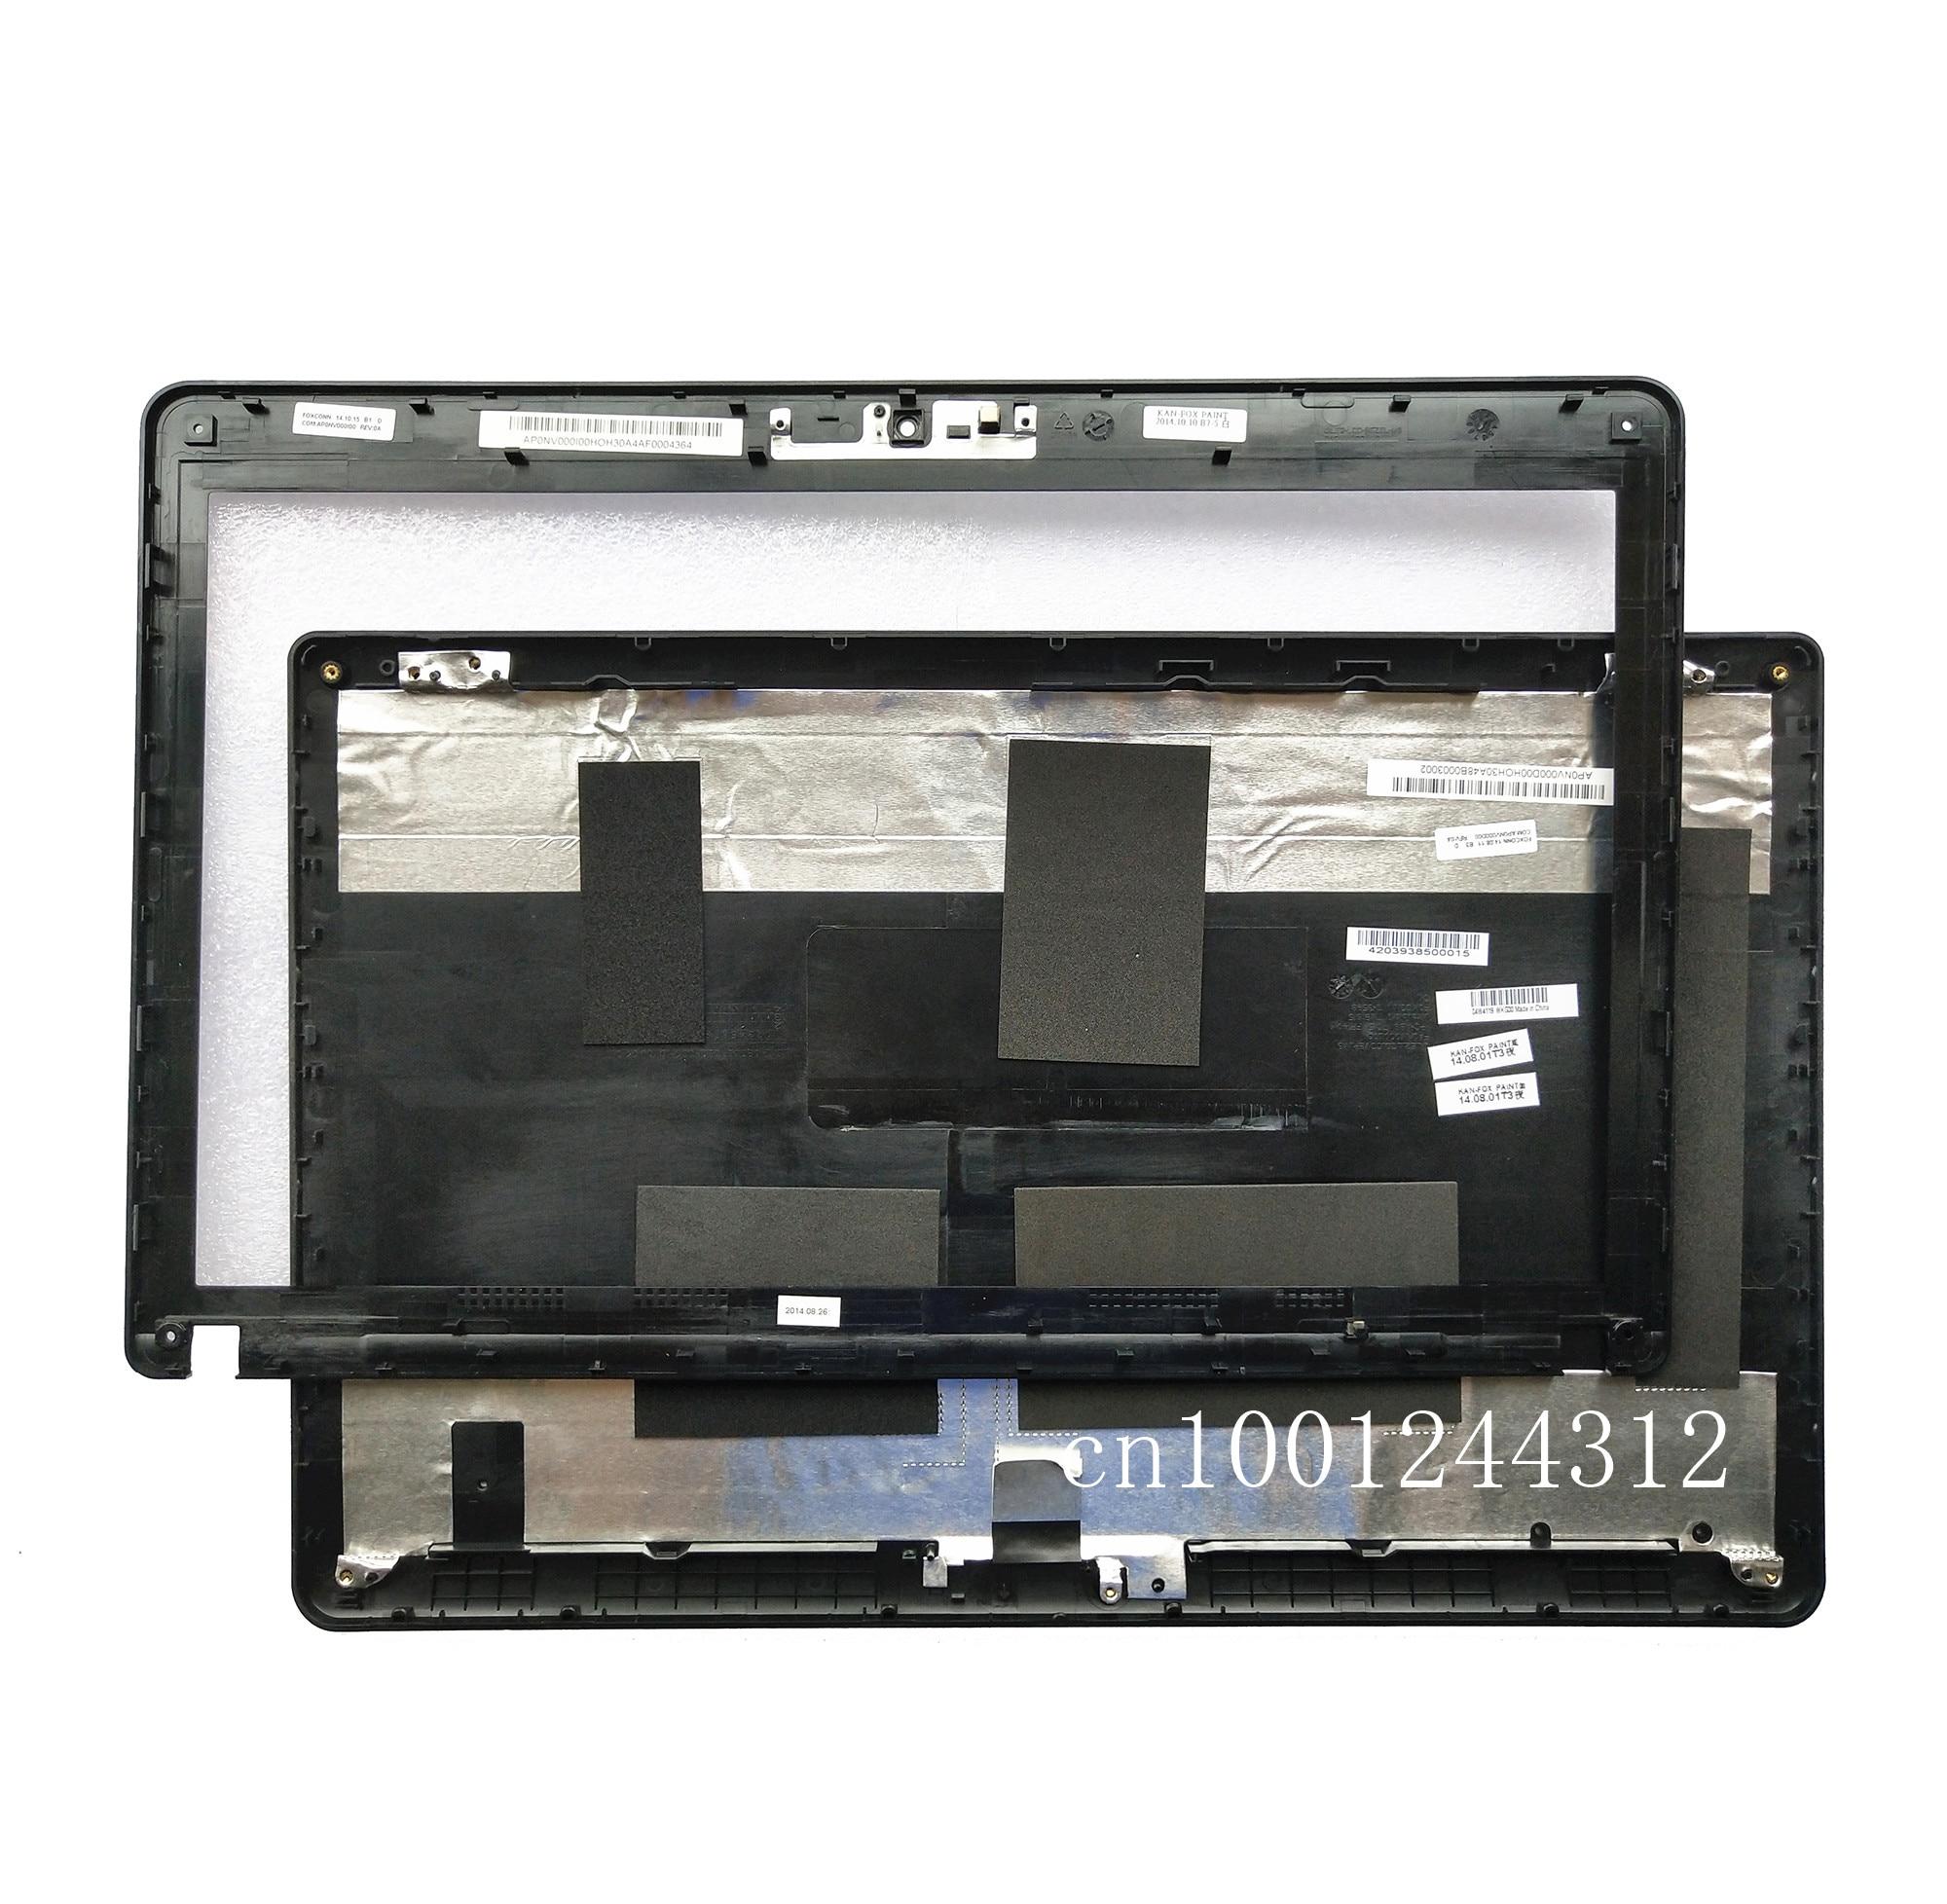 Nuevo Original para Lenovo Thinkpad Edge E530 E535 E530C E545 LCD tapa trasera superior cubierta trasera/bisel 04W4119 04W4233 plástico